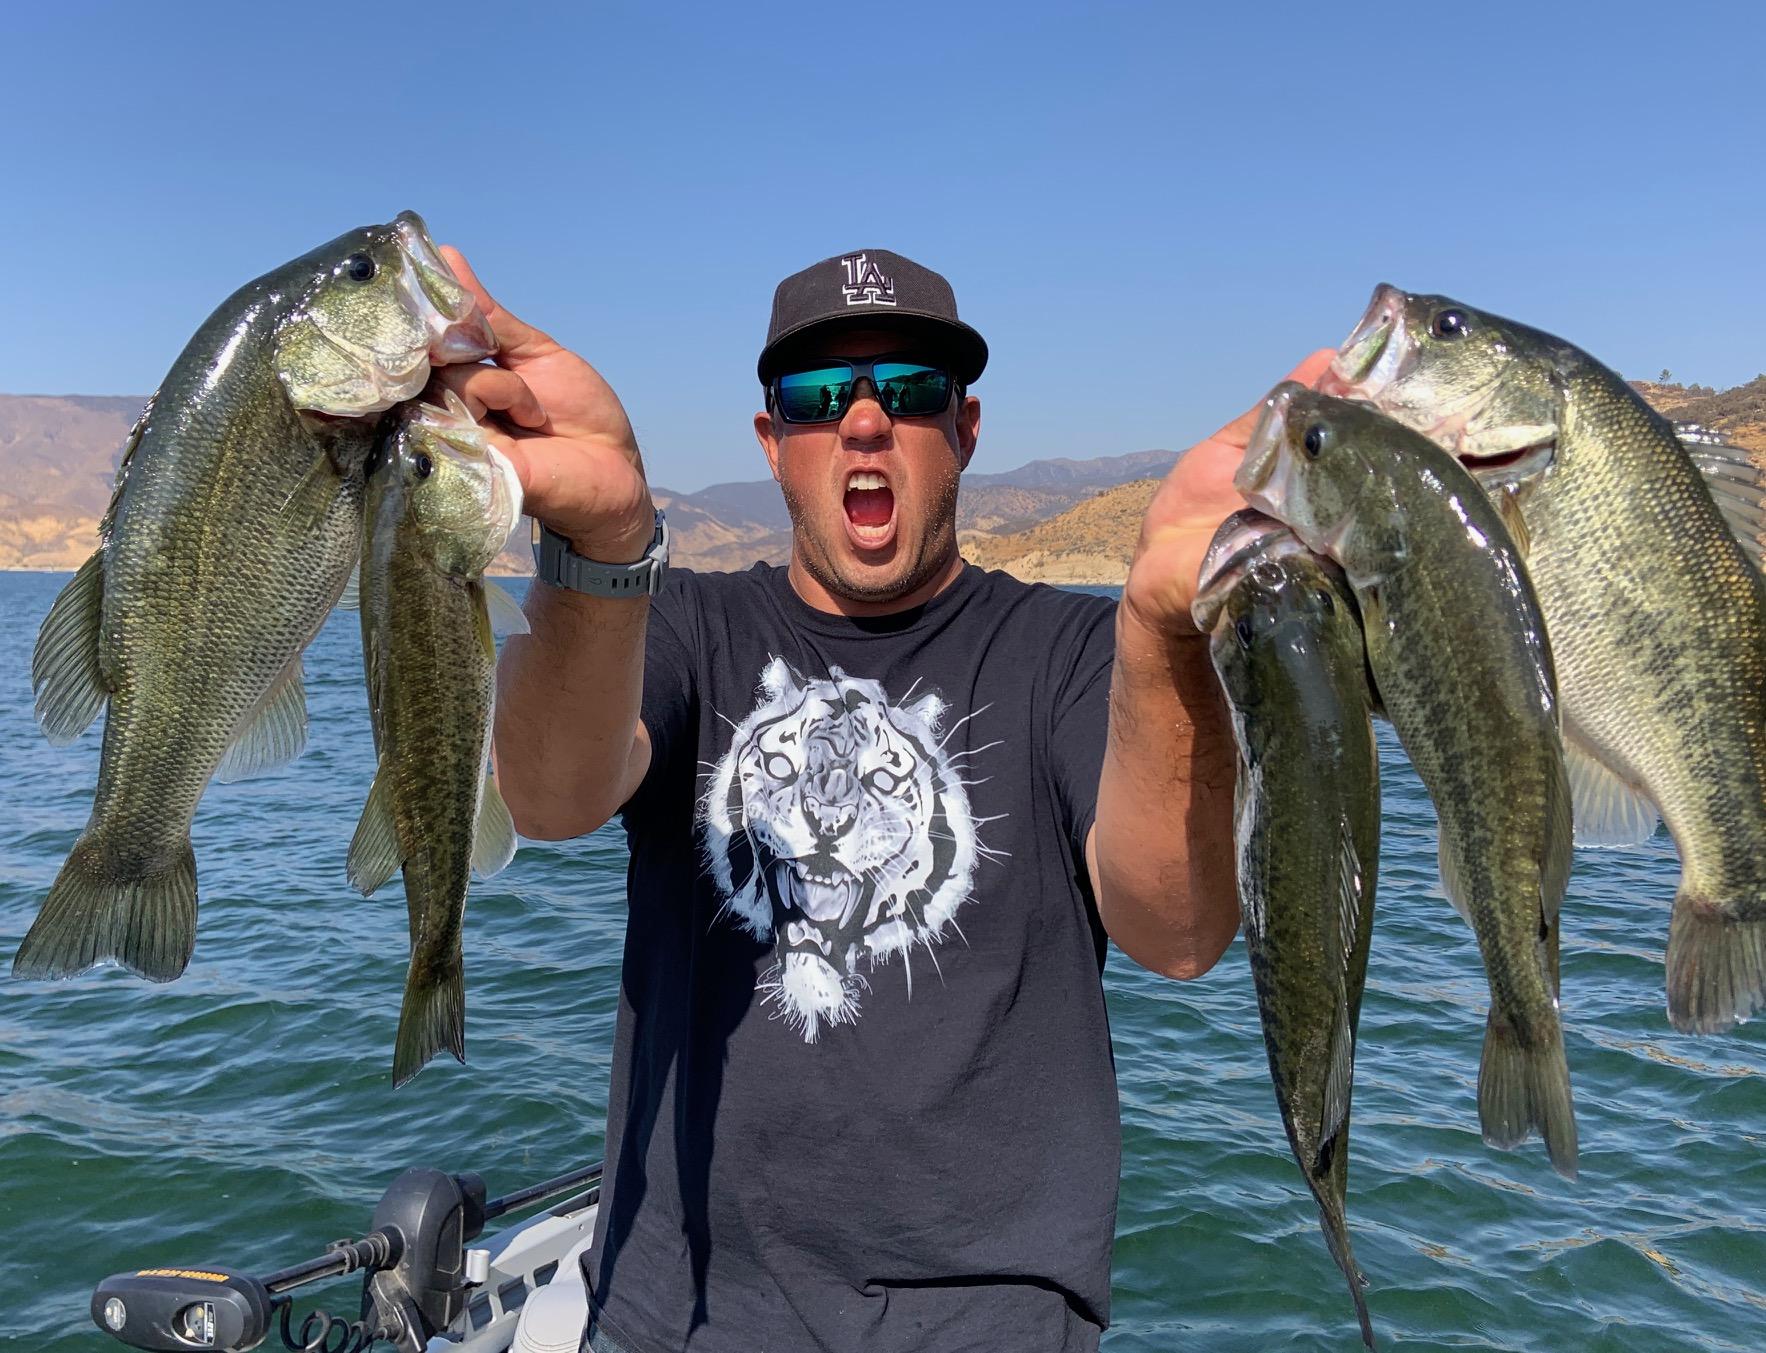 Castaic Lake Bass Fishing Guide 11/01/2019